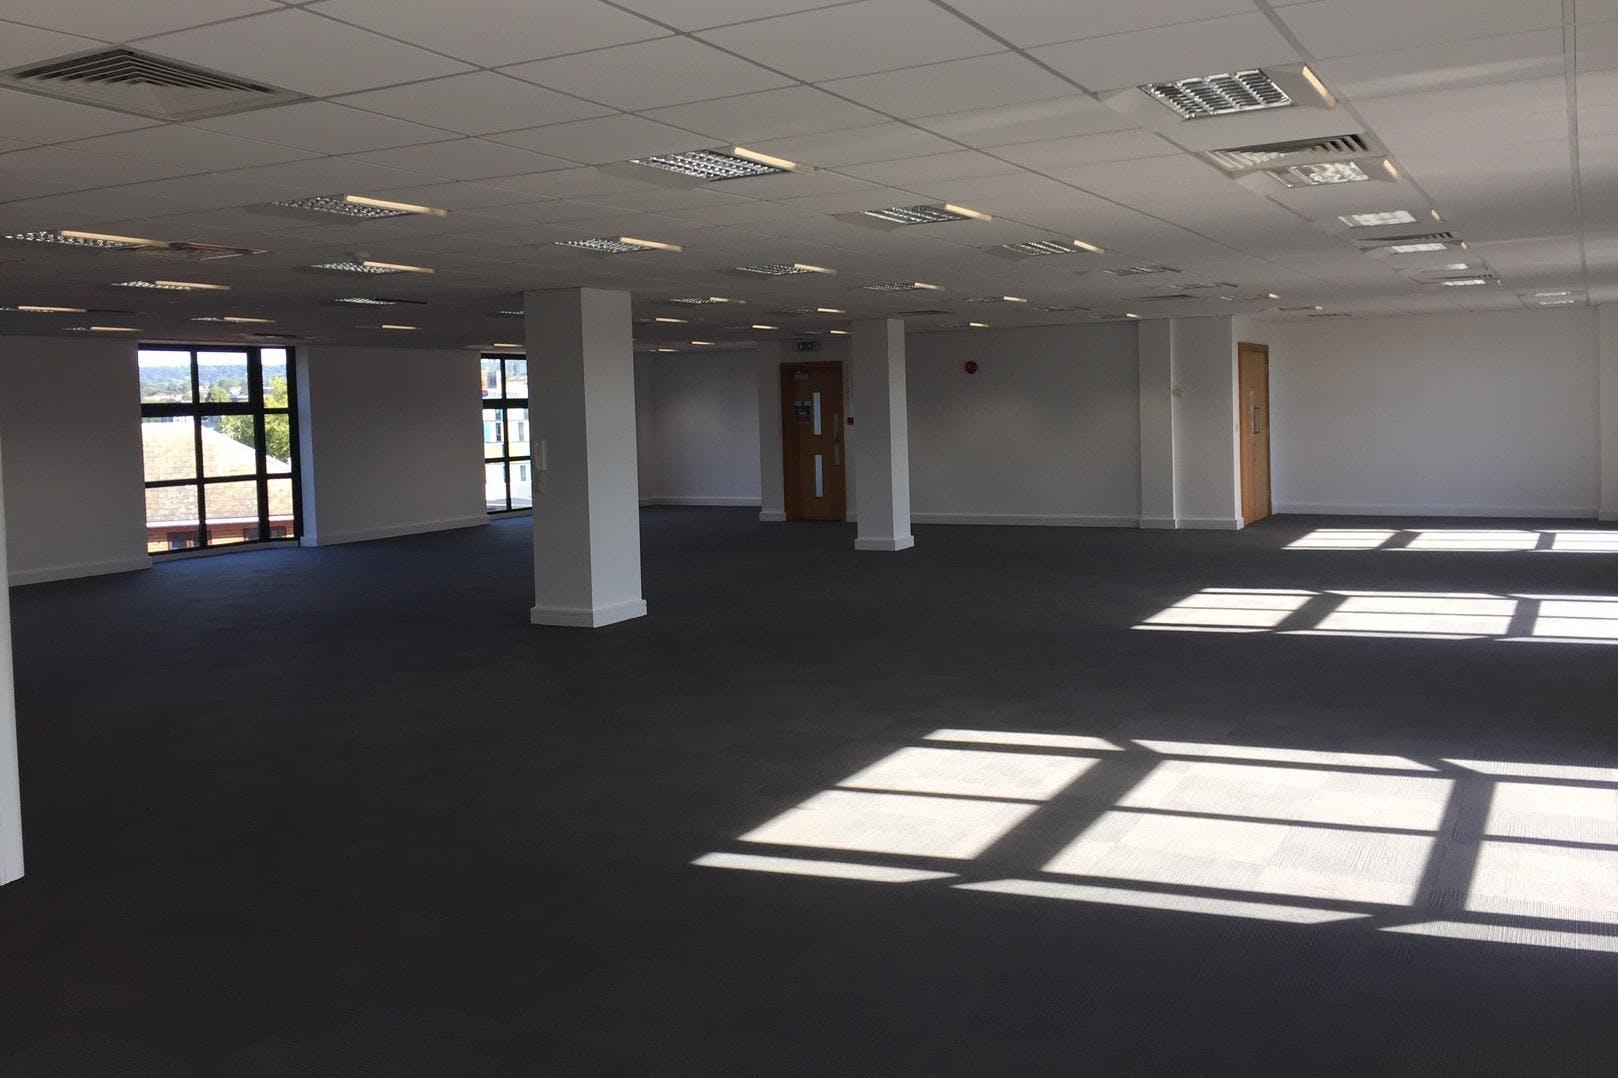 Vaughan Chambers, 4 Tonbridge Road, Maidstone, Office To Let - Maidstone Vaughan Chambers 3.JPG